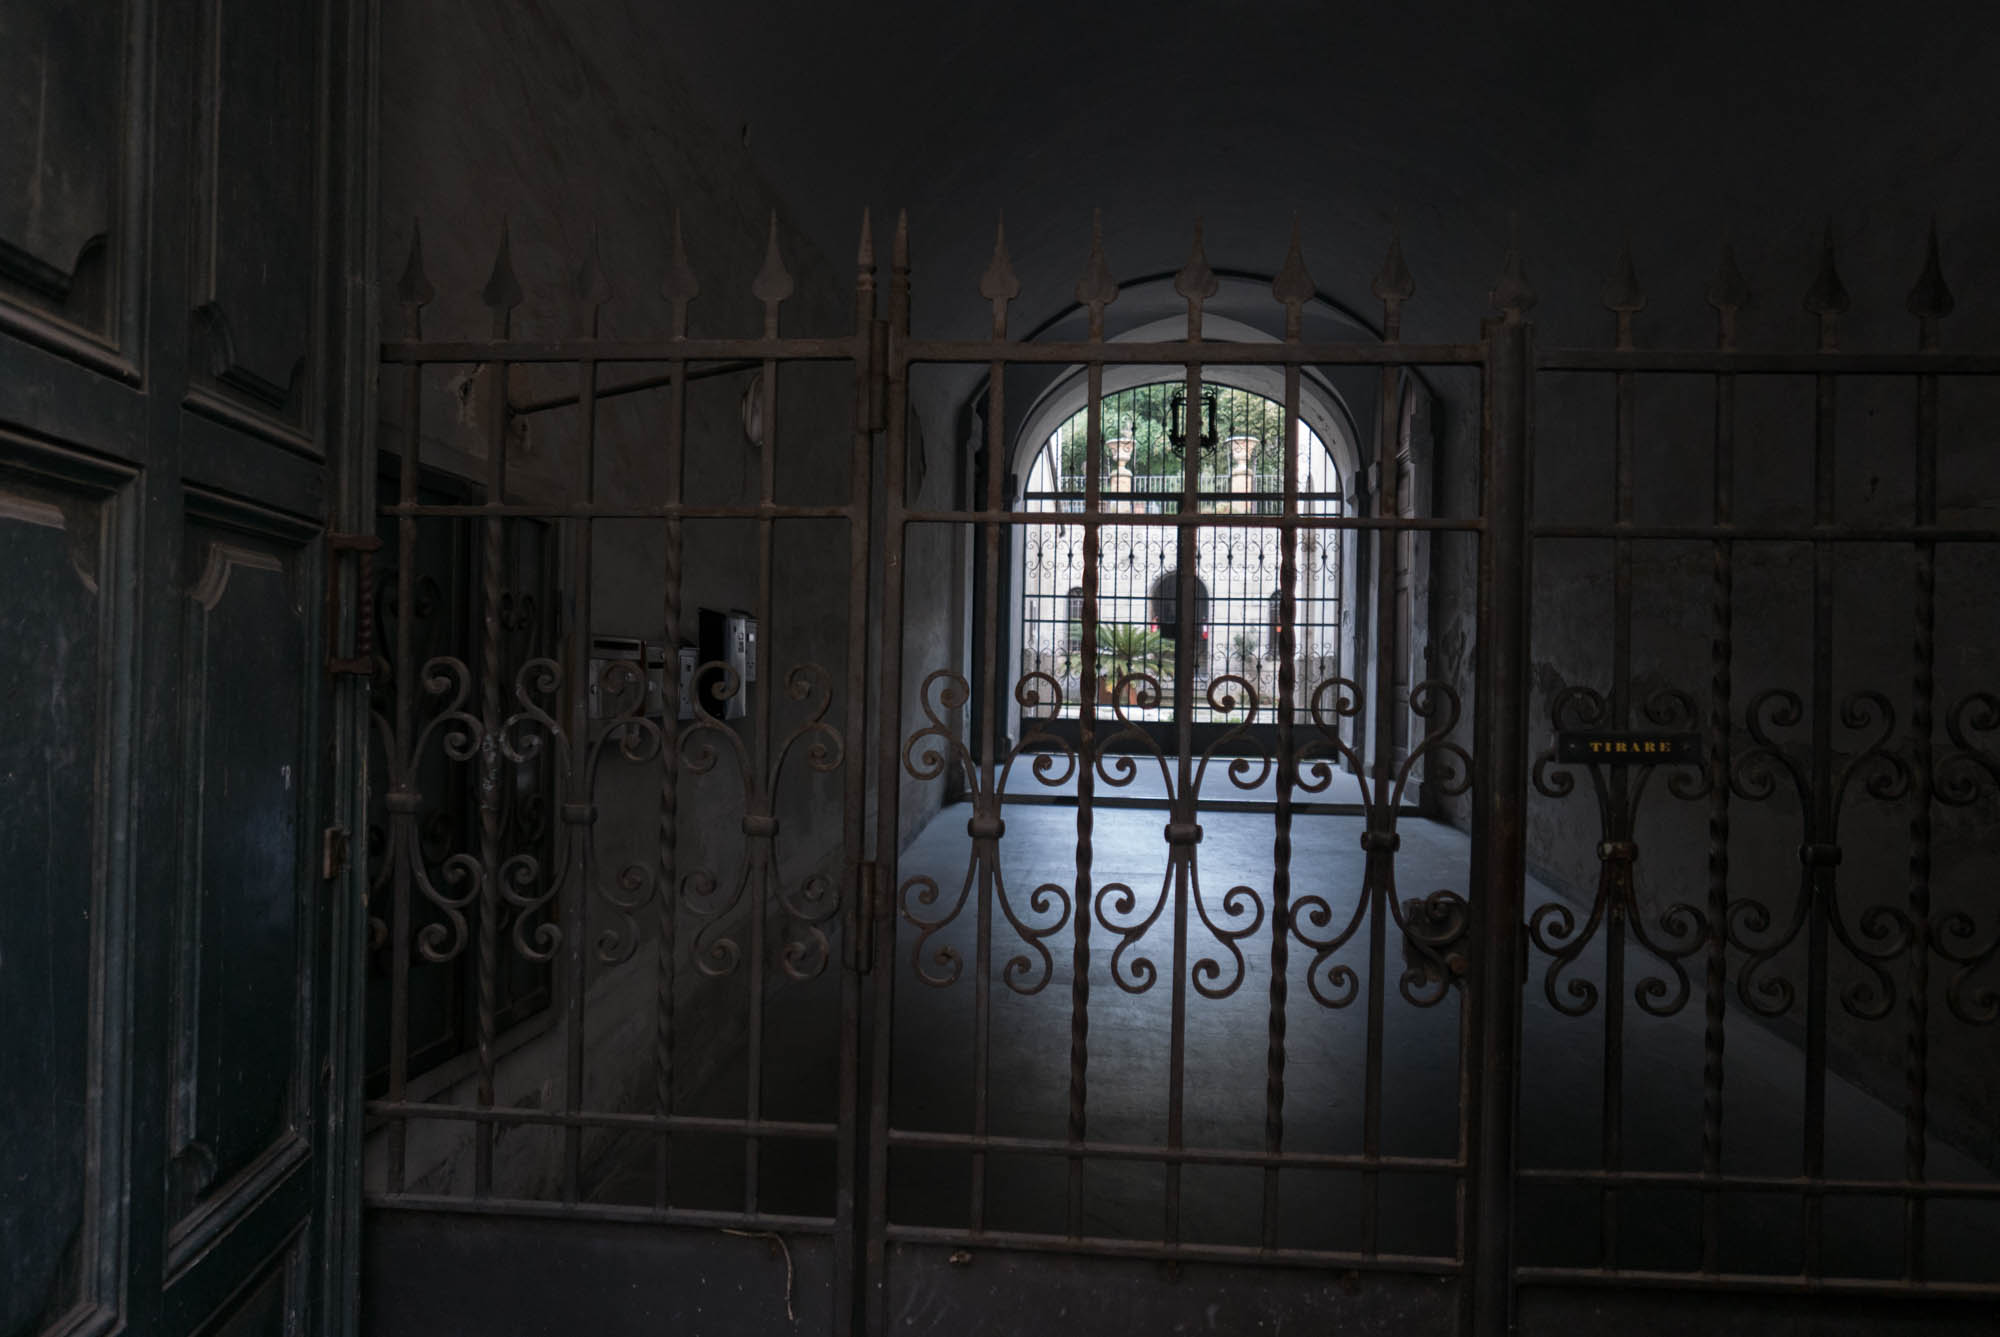 Former Hotel delle Belle Arti where Freud stayed in Orvieto